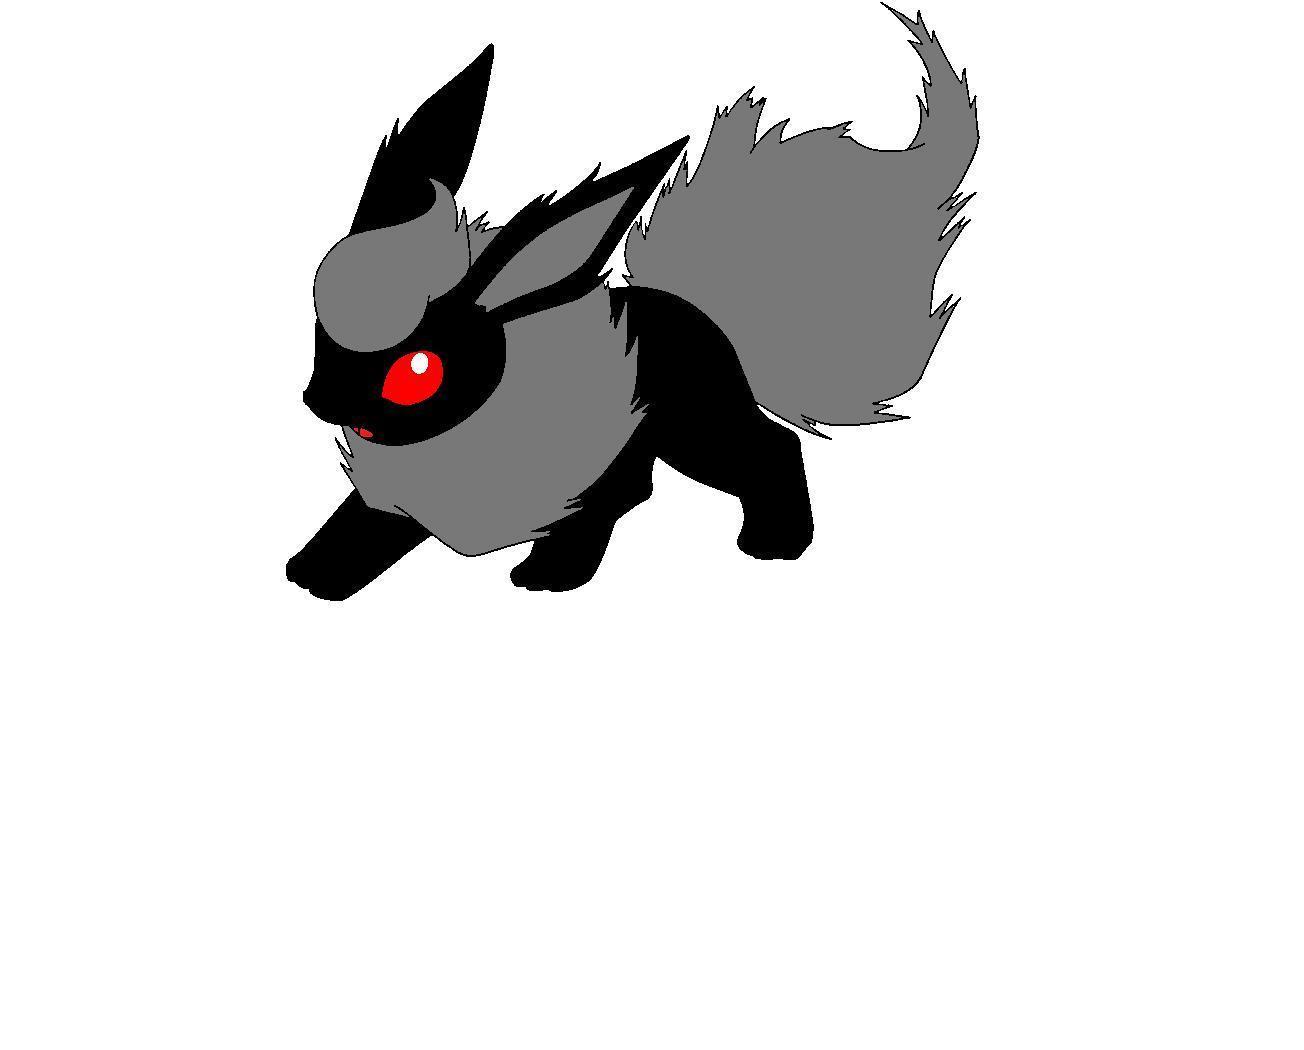 evil pokemon wallpaper - photo #5